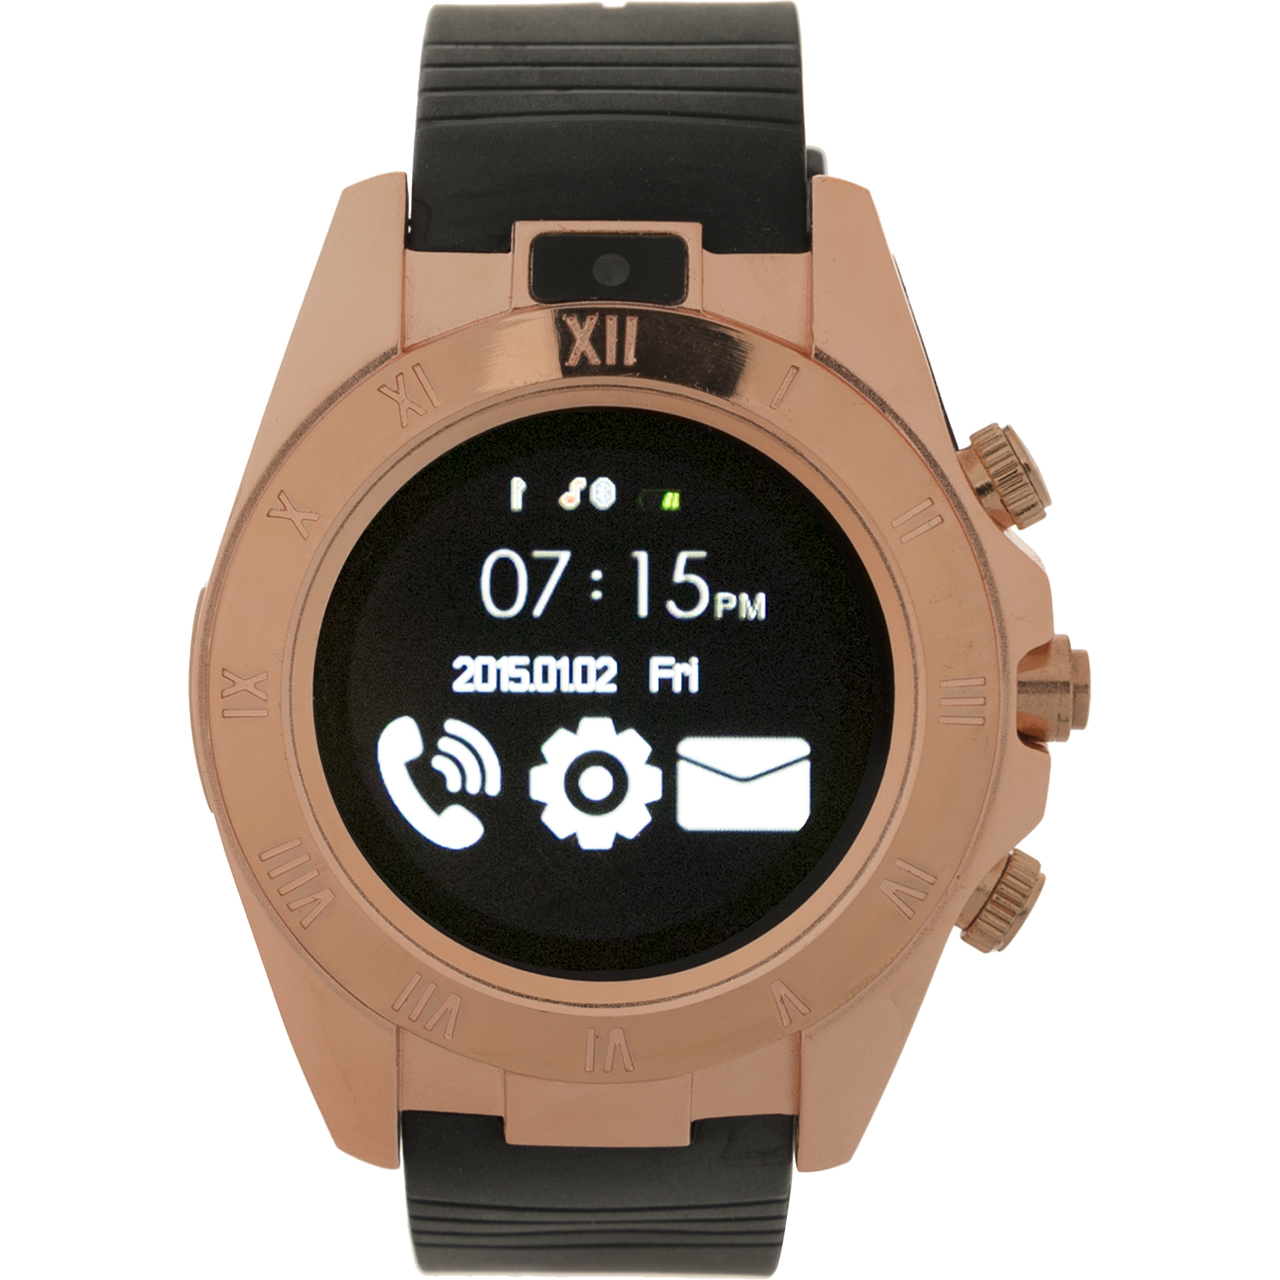 خرید ساعت هوشمند مدل SW007 الف 001